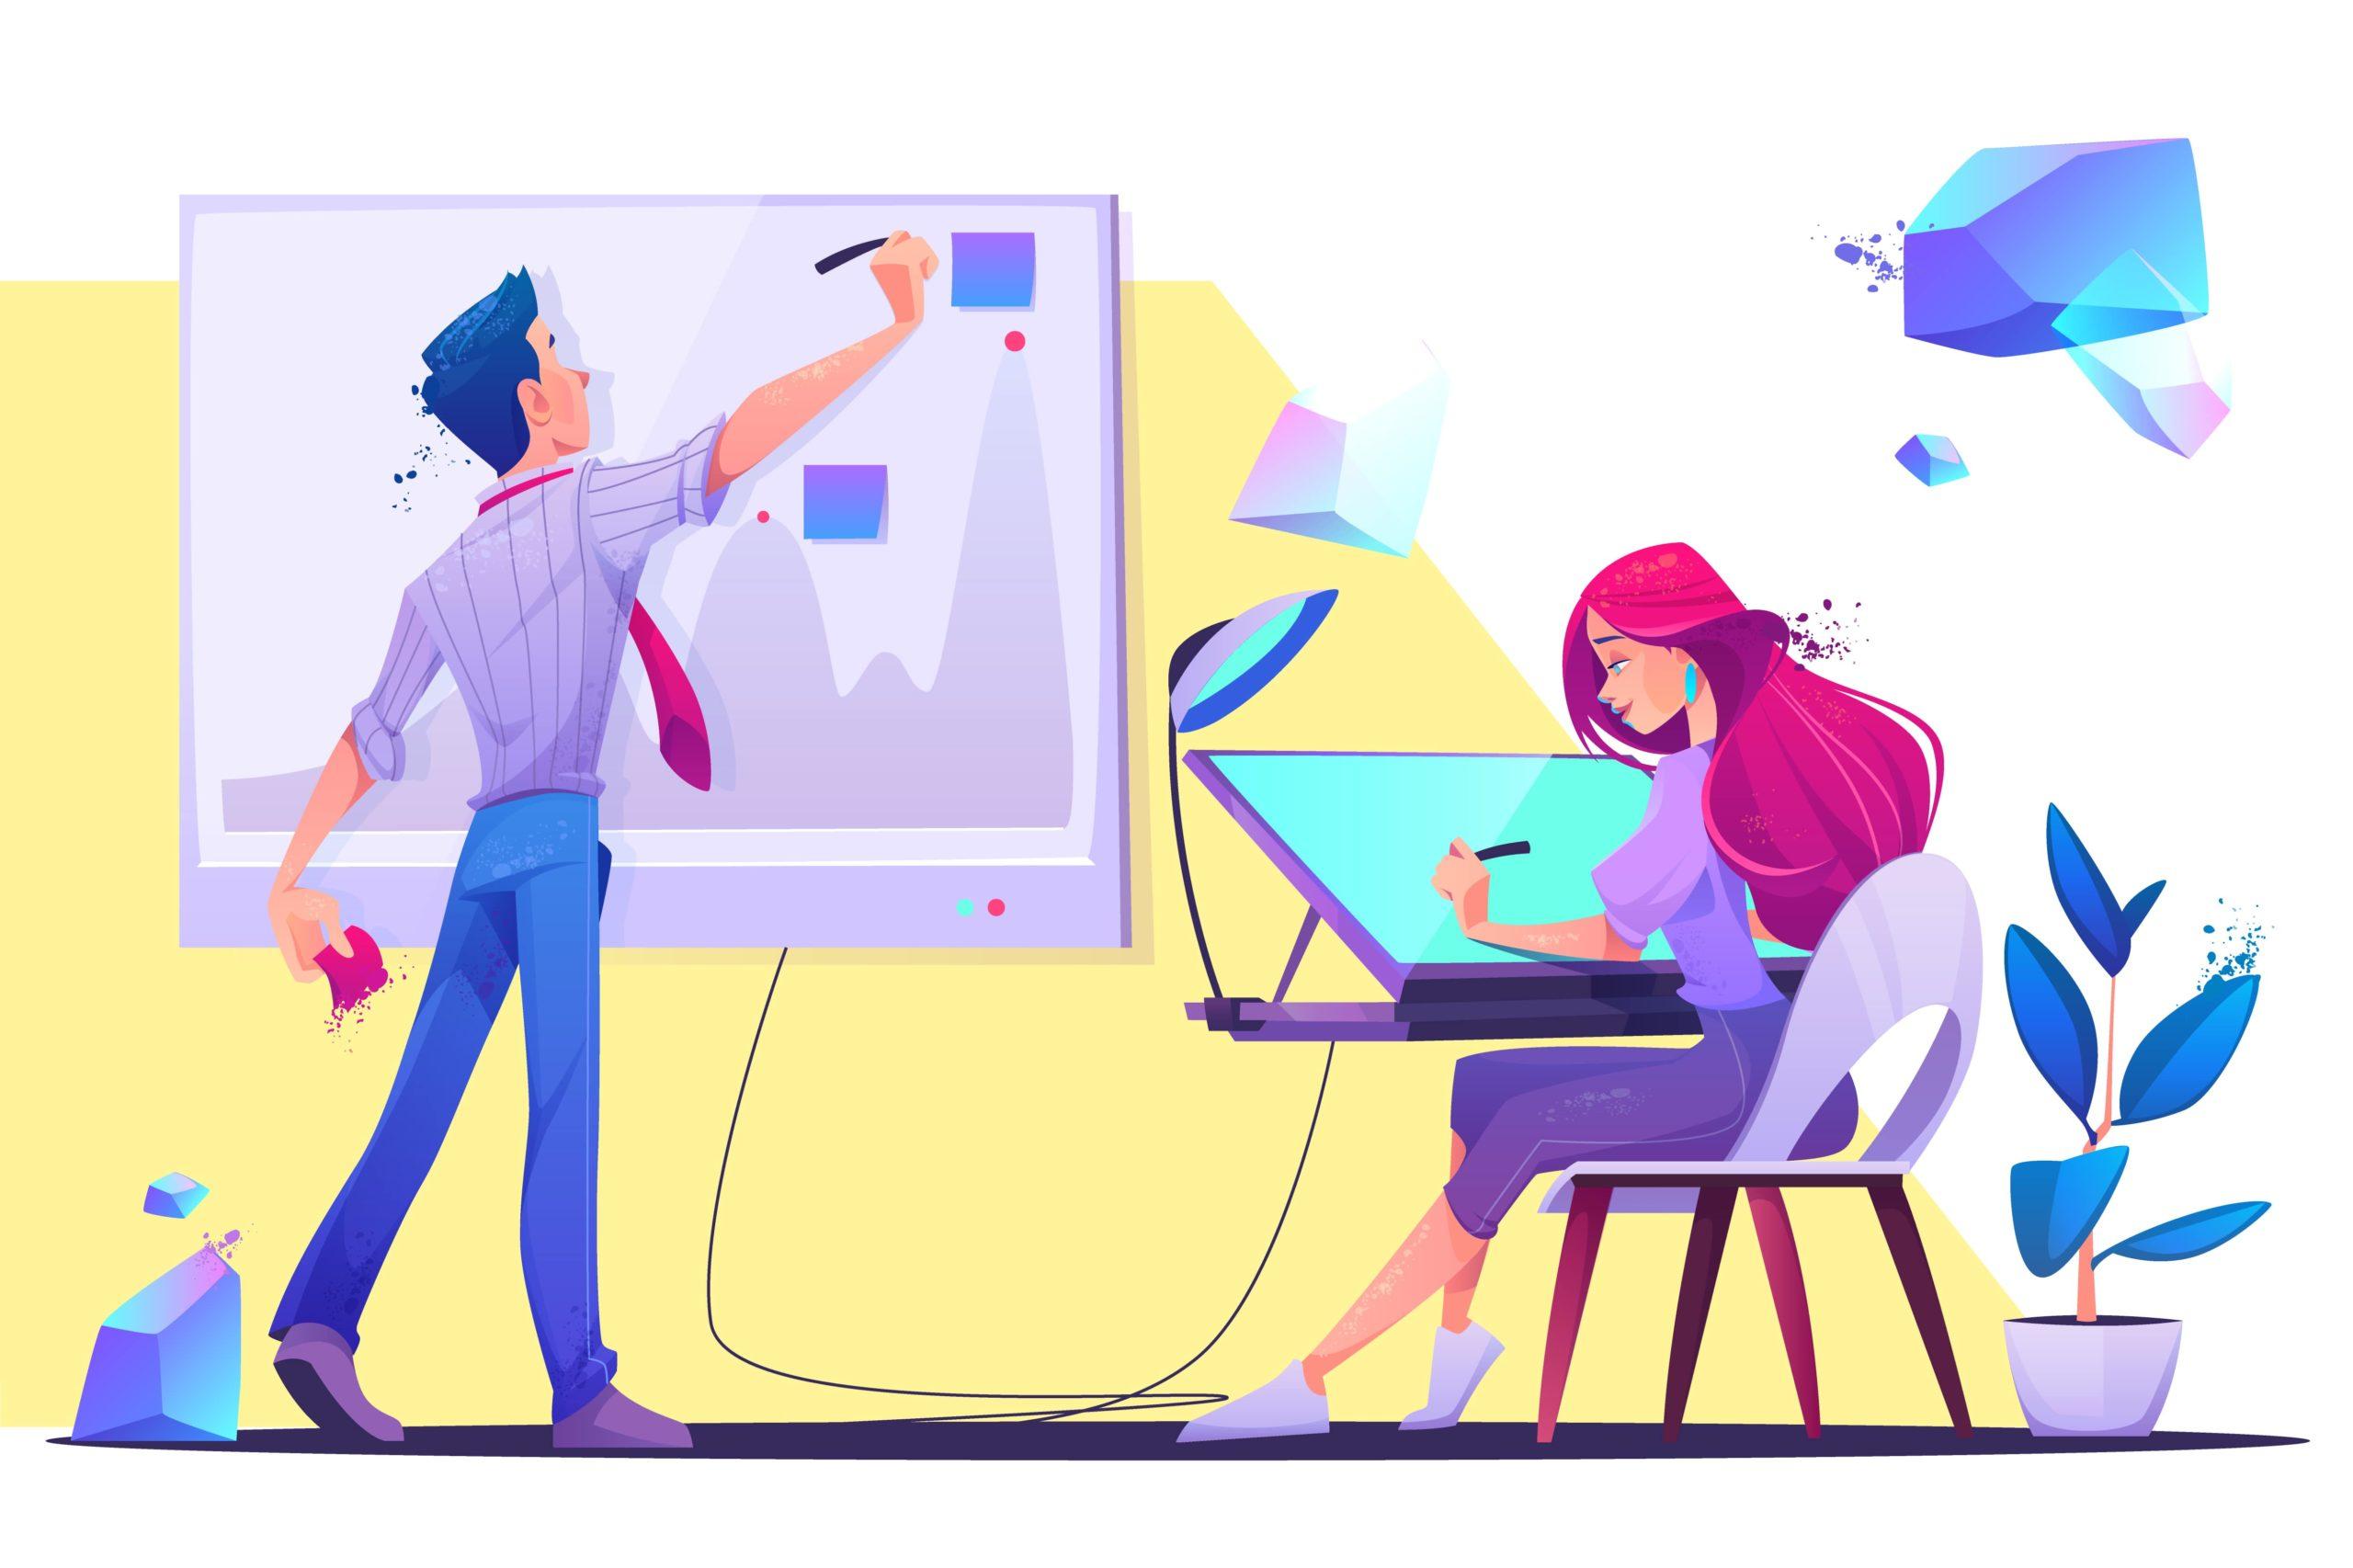 hot reloading for designer-developer cooperation